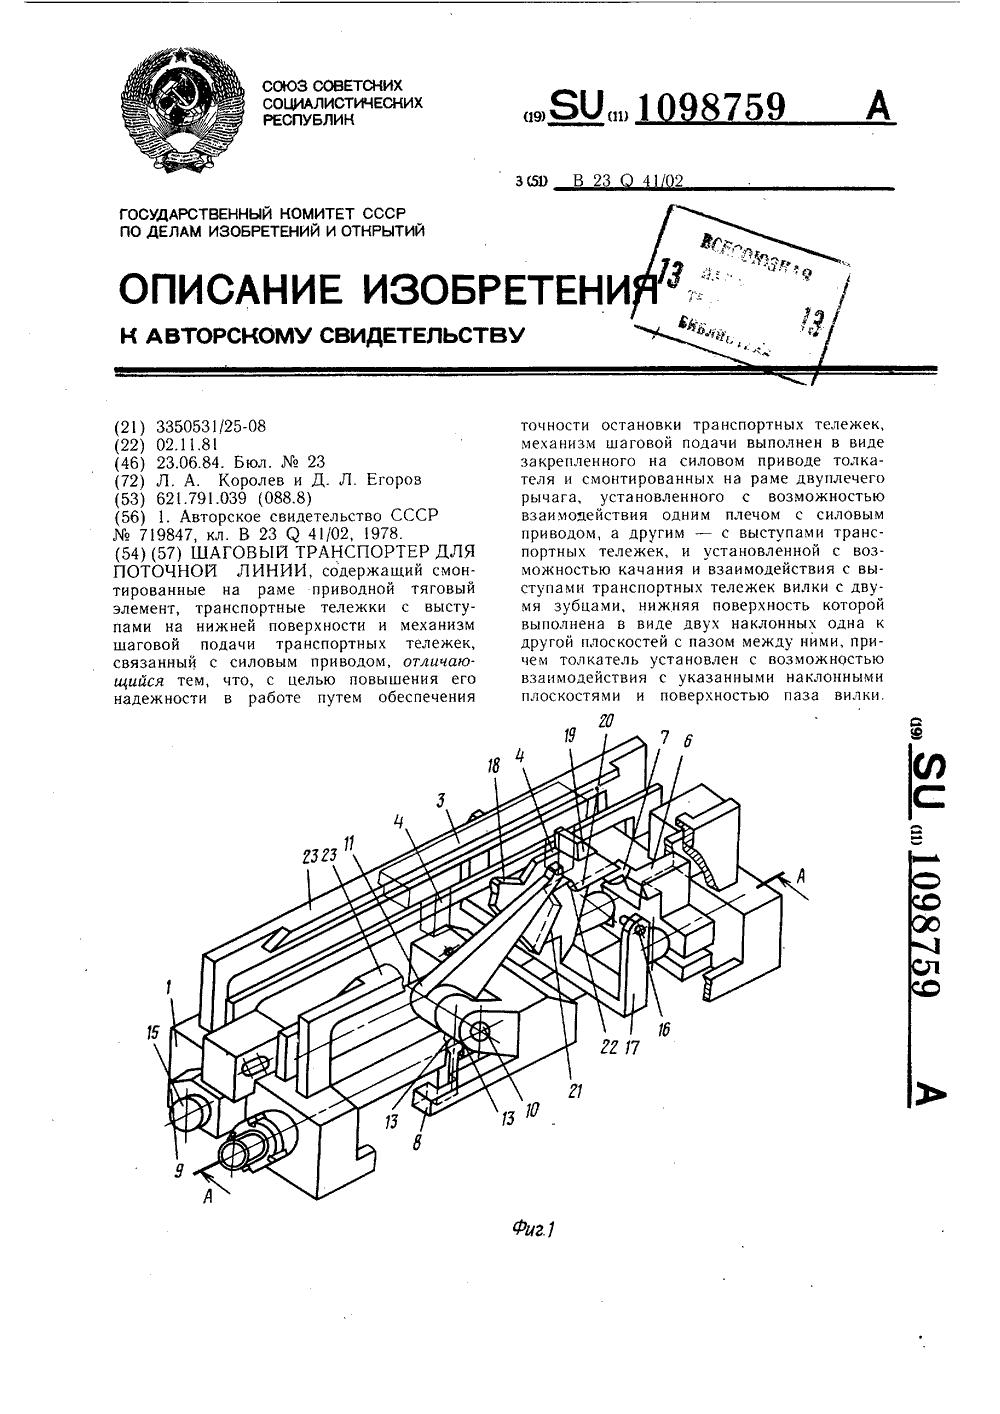 Шаговый транспортер фольксваген транспортер ат